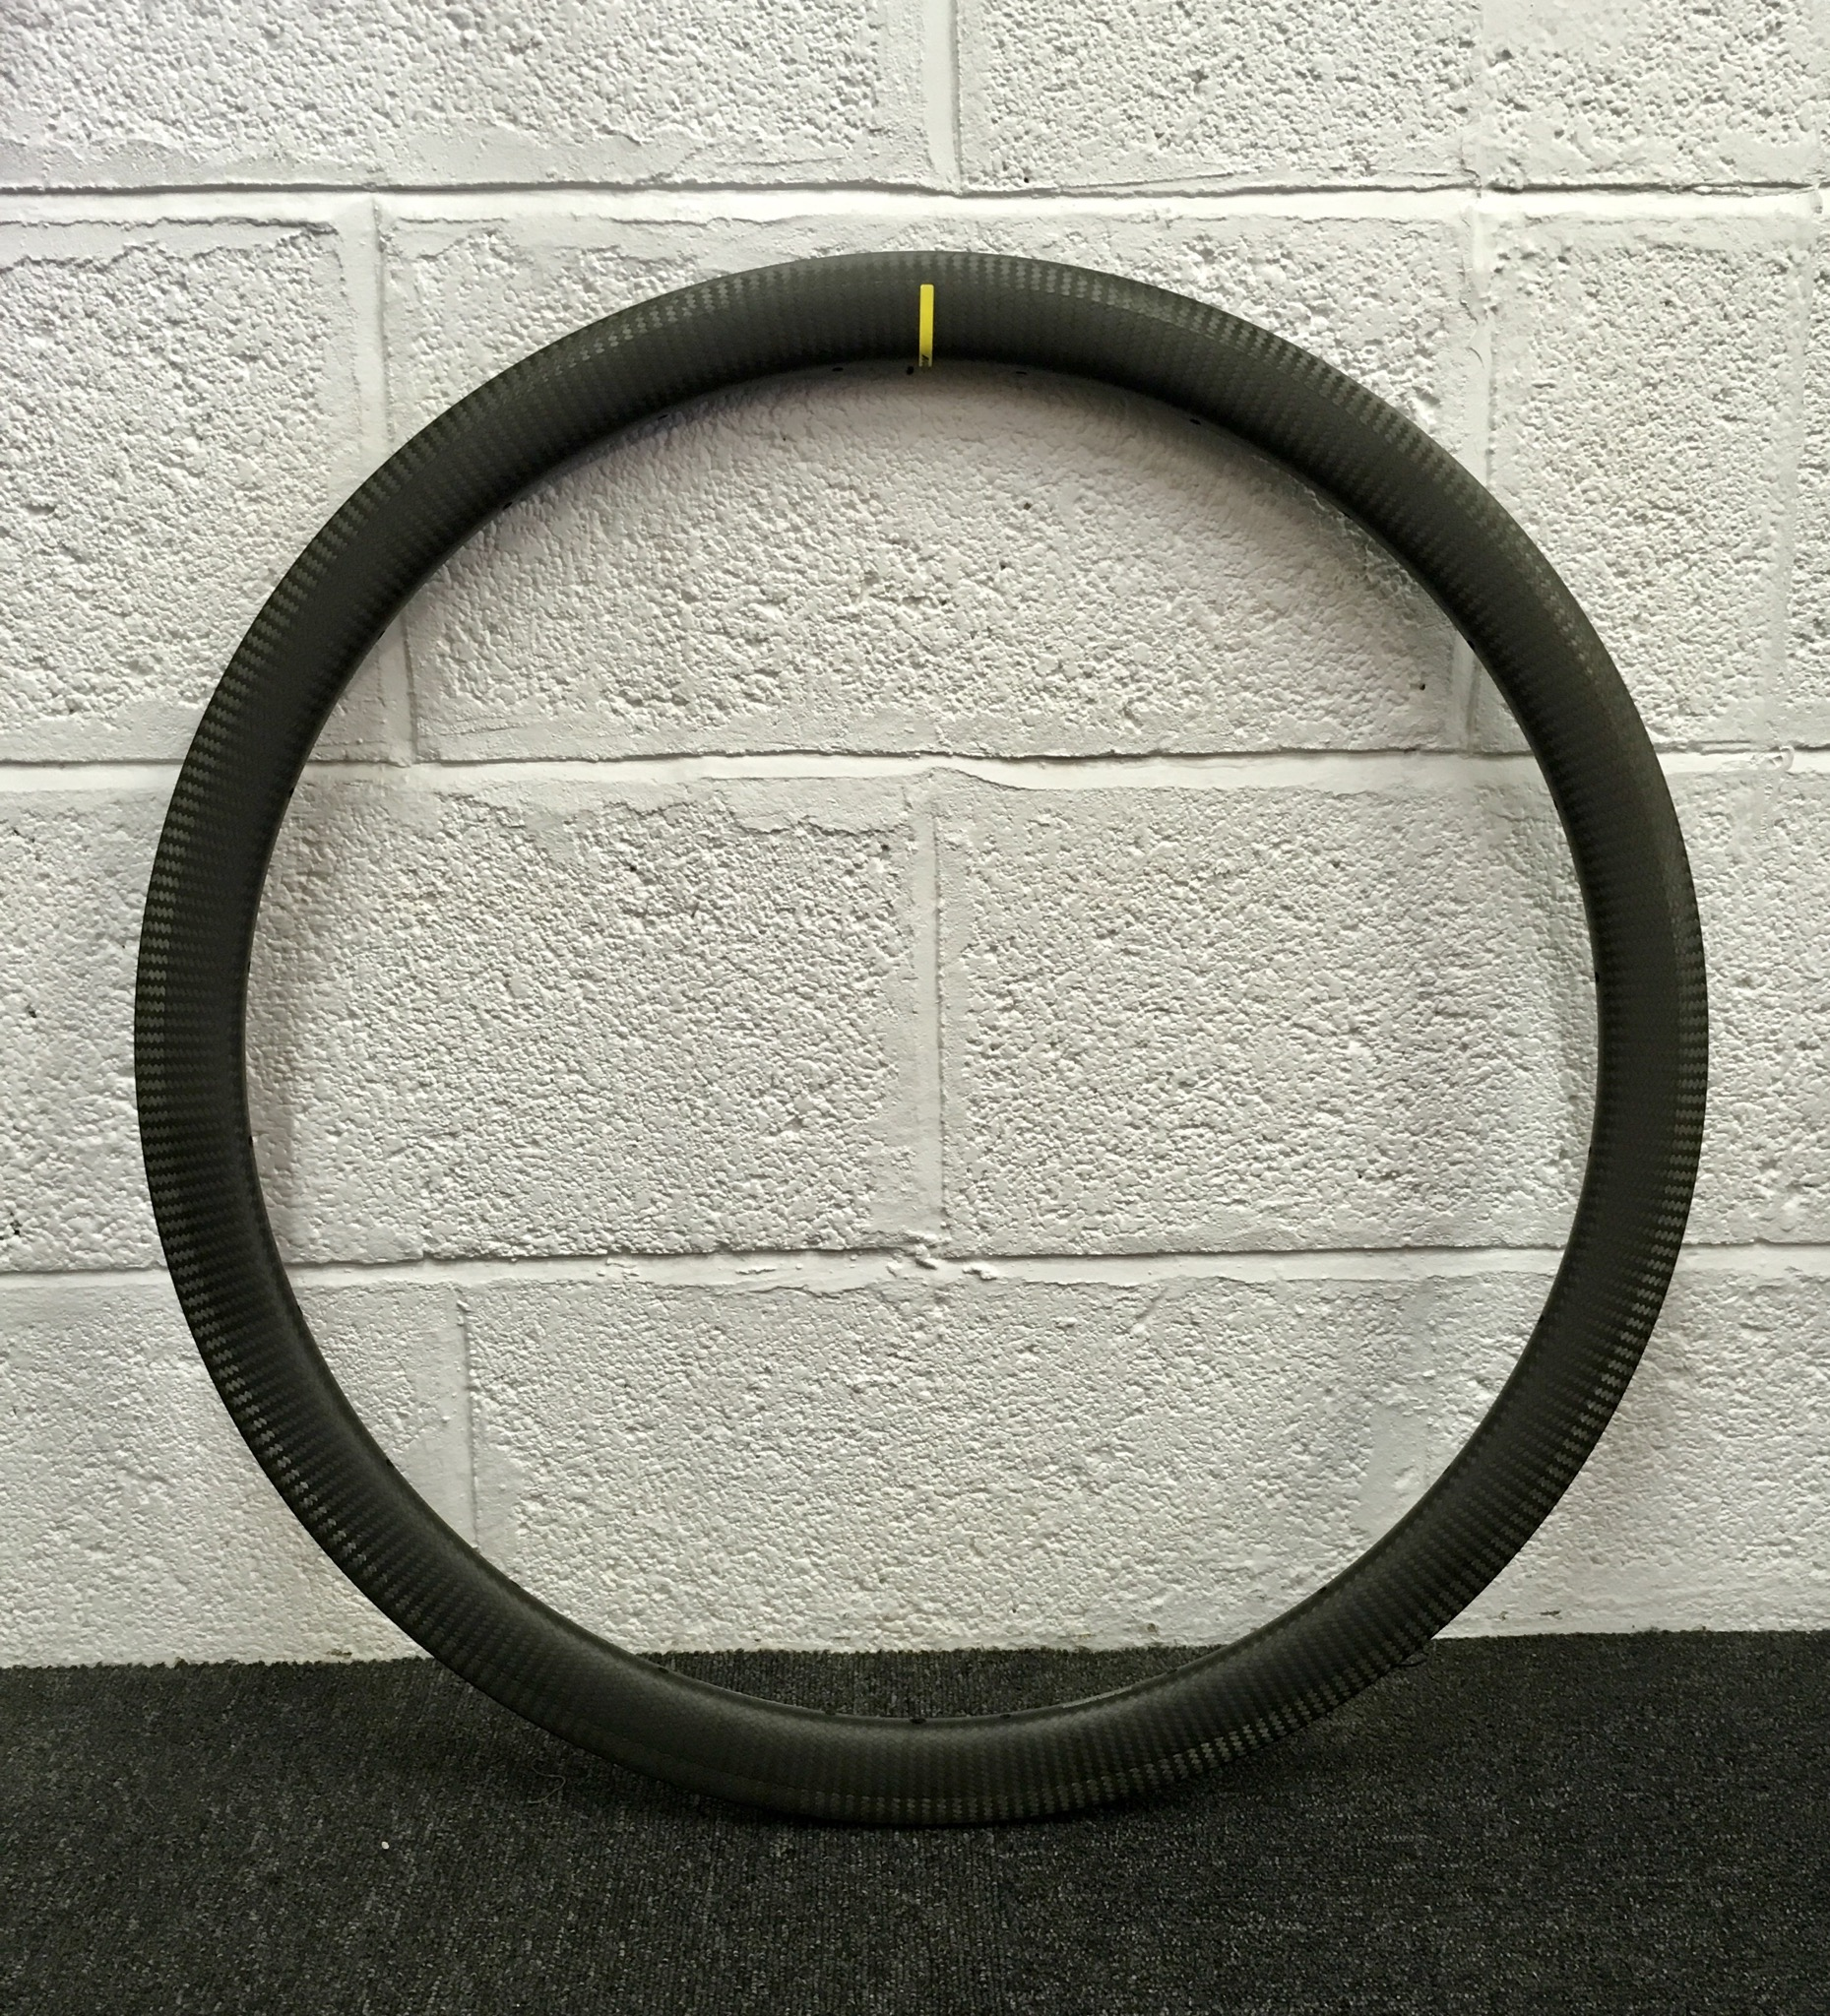 Mavic CXP Carbon rim (used on Mavic Cosmic Pro Carbon Sl)  Rim weight 430g  Rim height 40mm  Cost £545 each rim